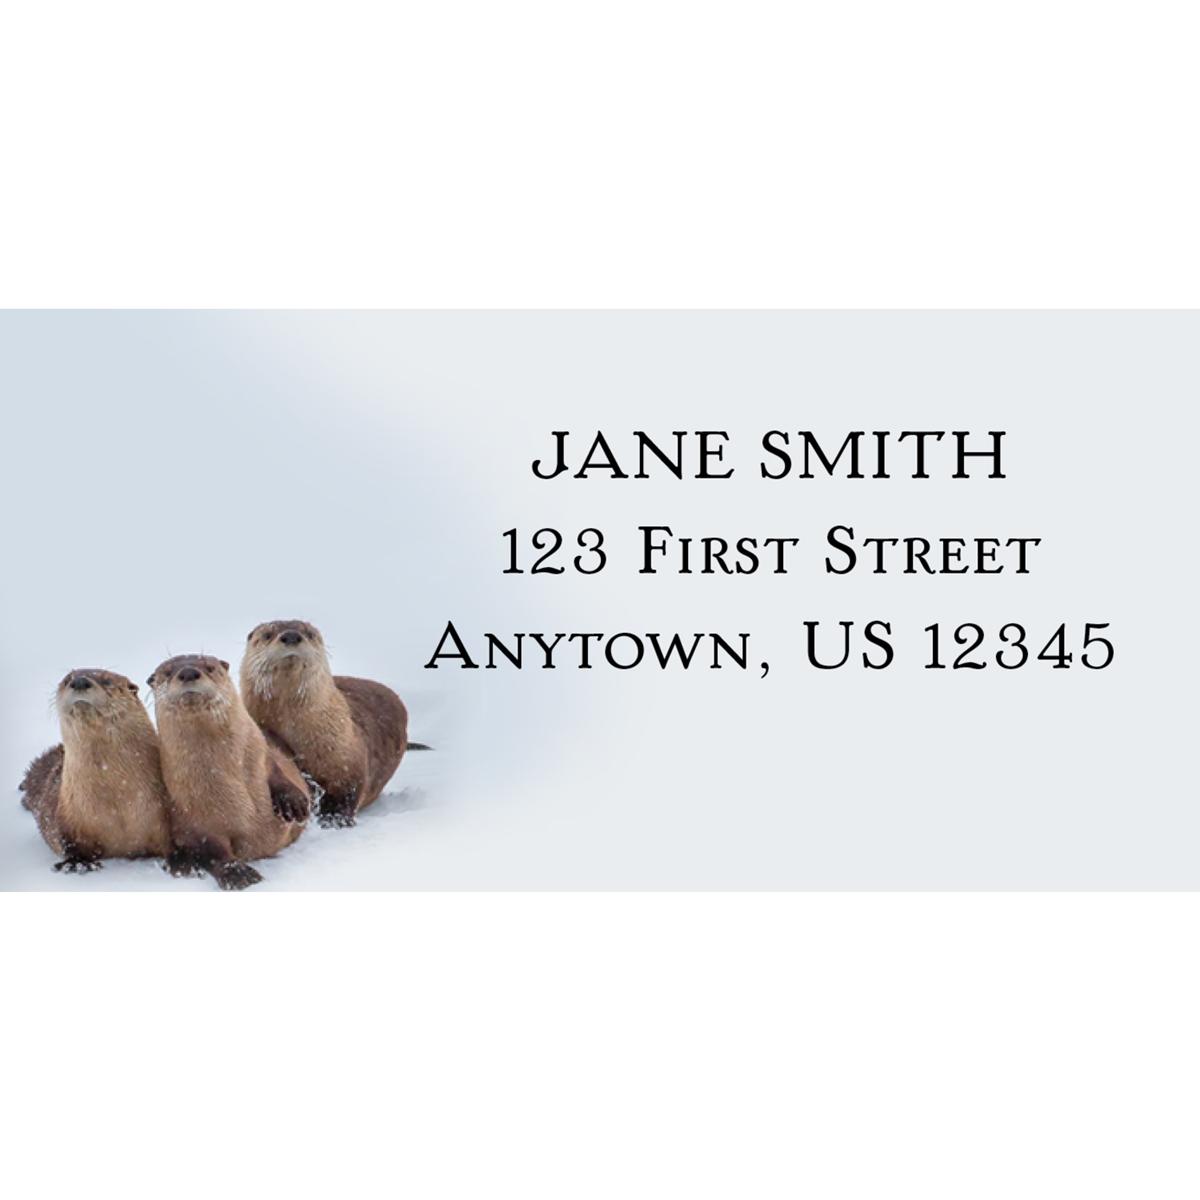 River Otters Along the Shoshone River Address Label